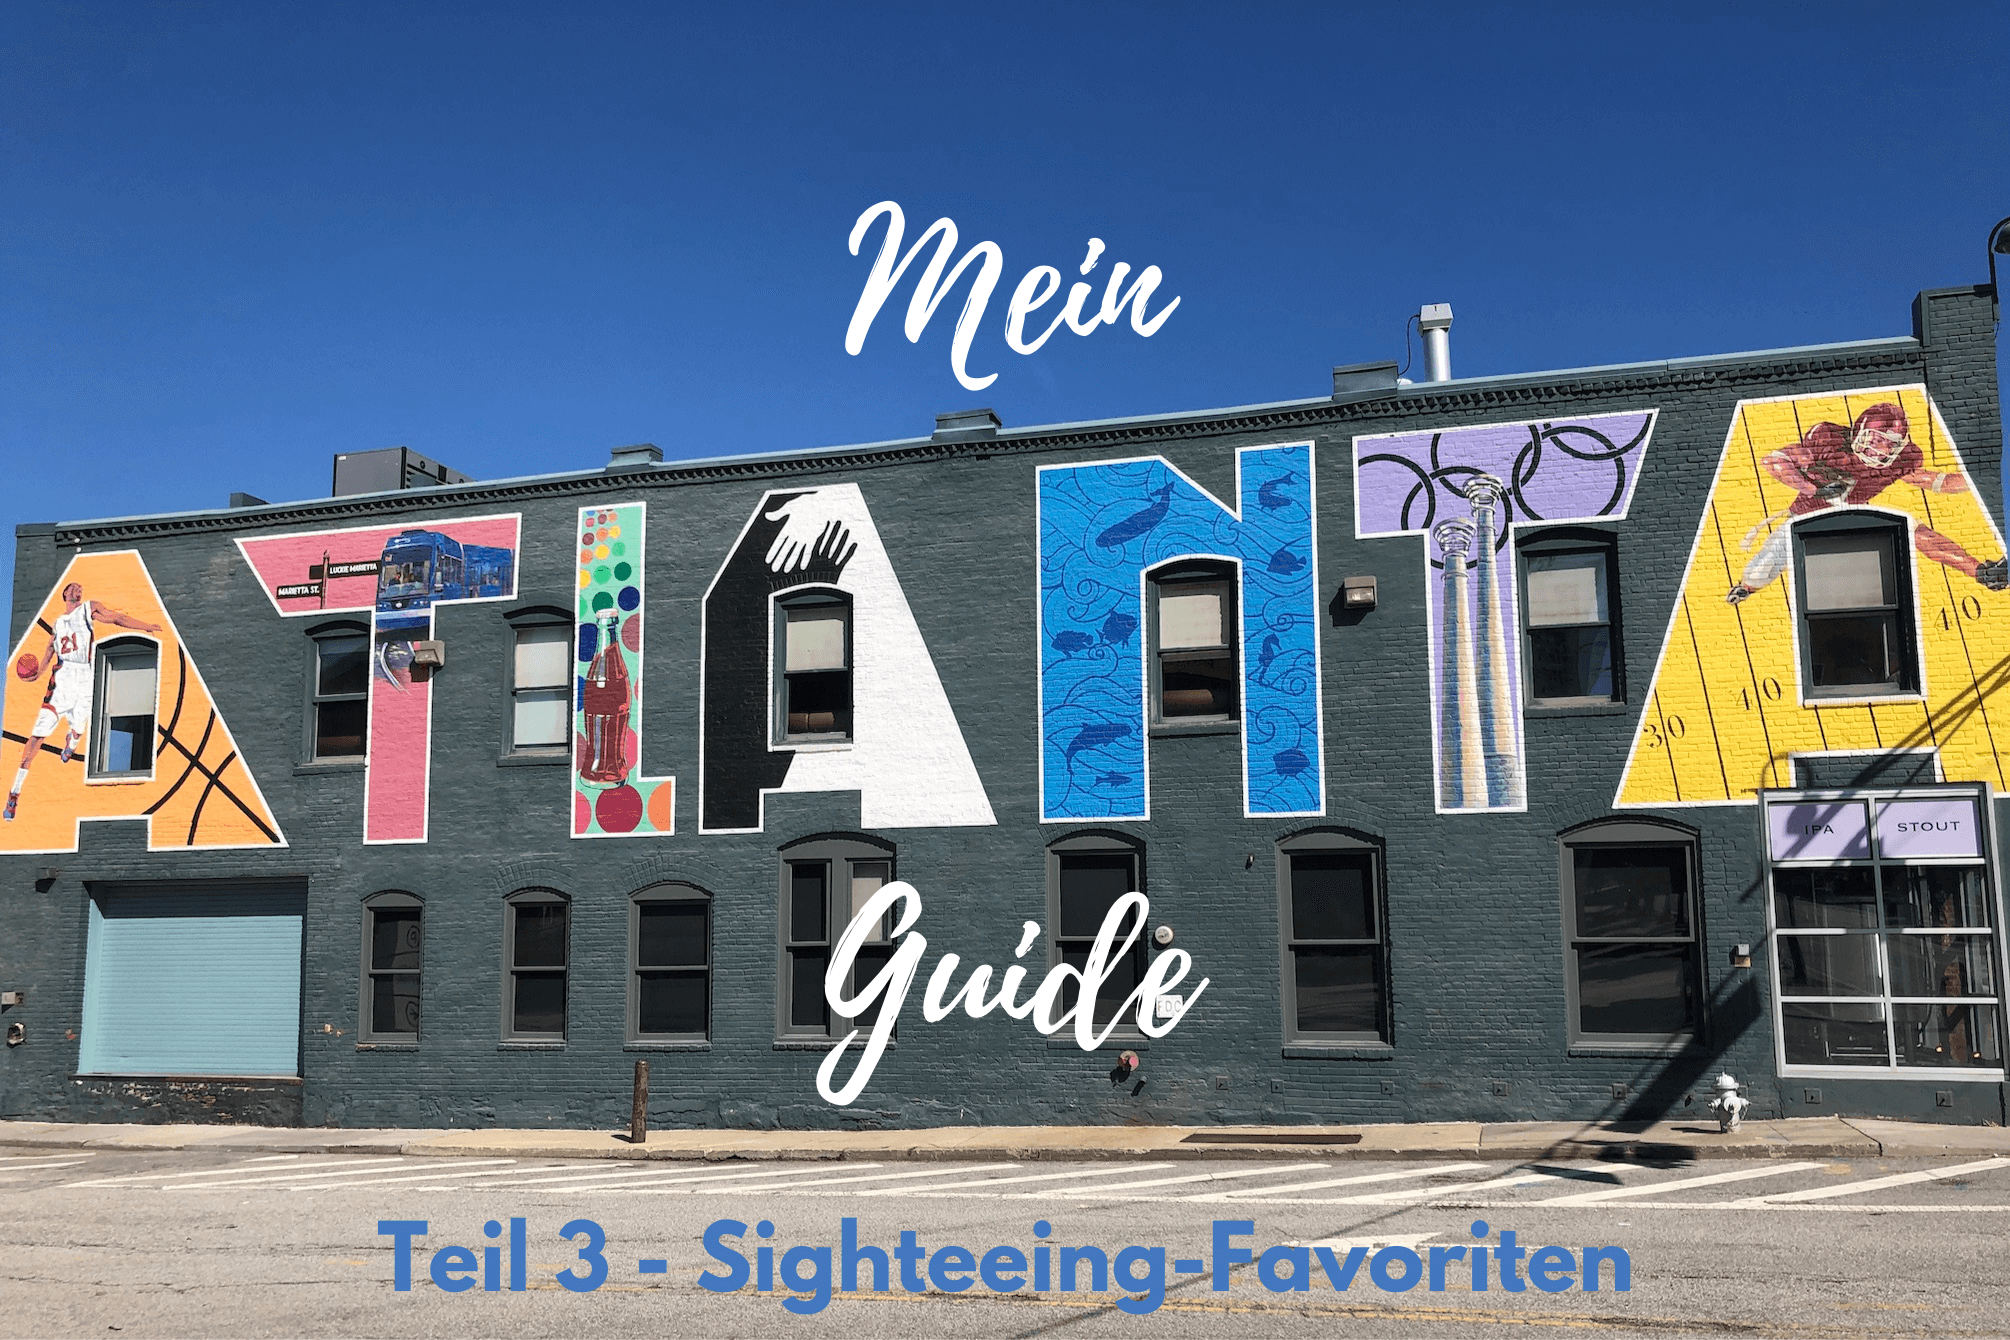 Mein kleine Atlanta Guide - Teil 3: Sightseeing-Favoriten - www.expatmamas.de/blog/ - #expatmamas #imauslandzuhause #expatinatlanta